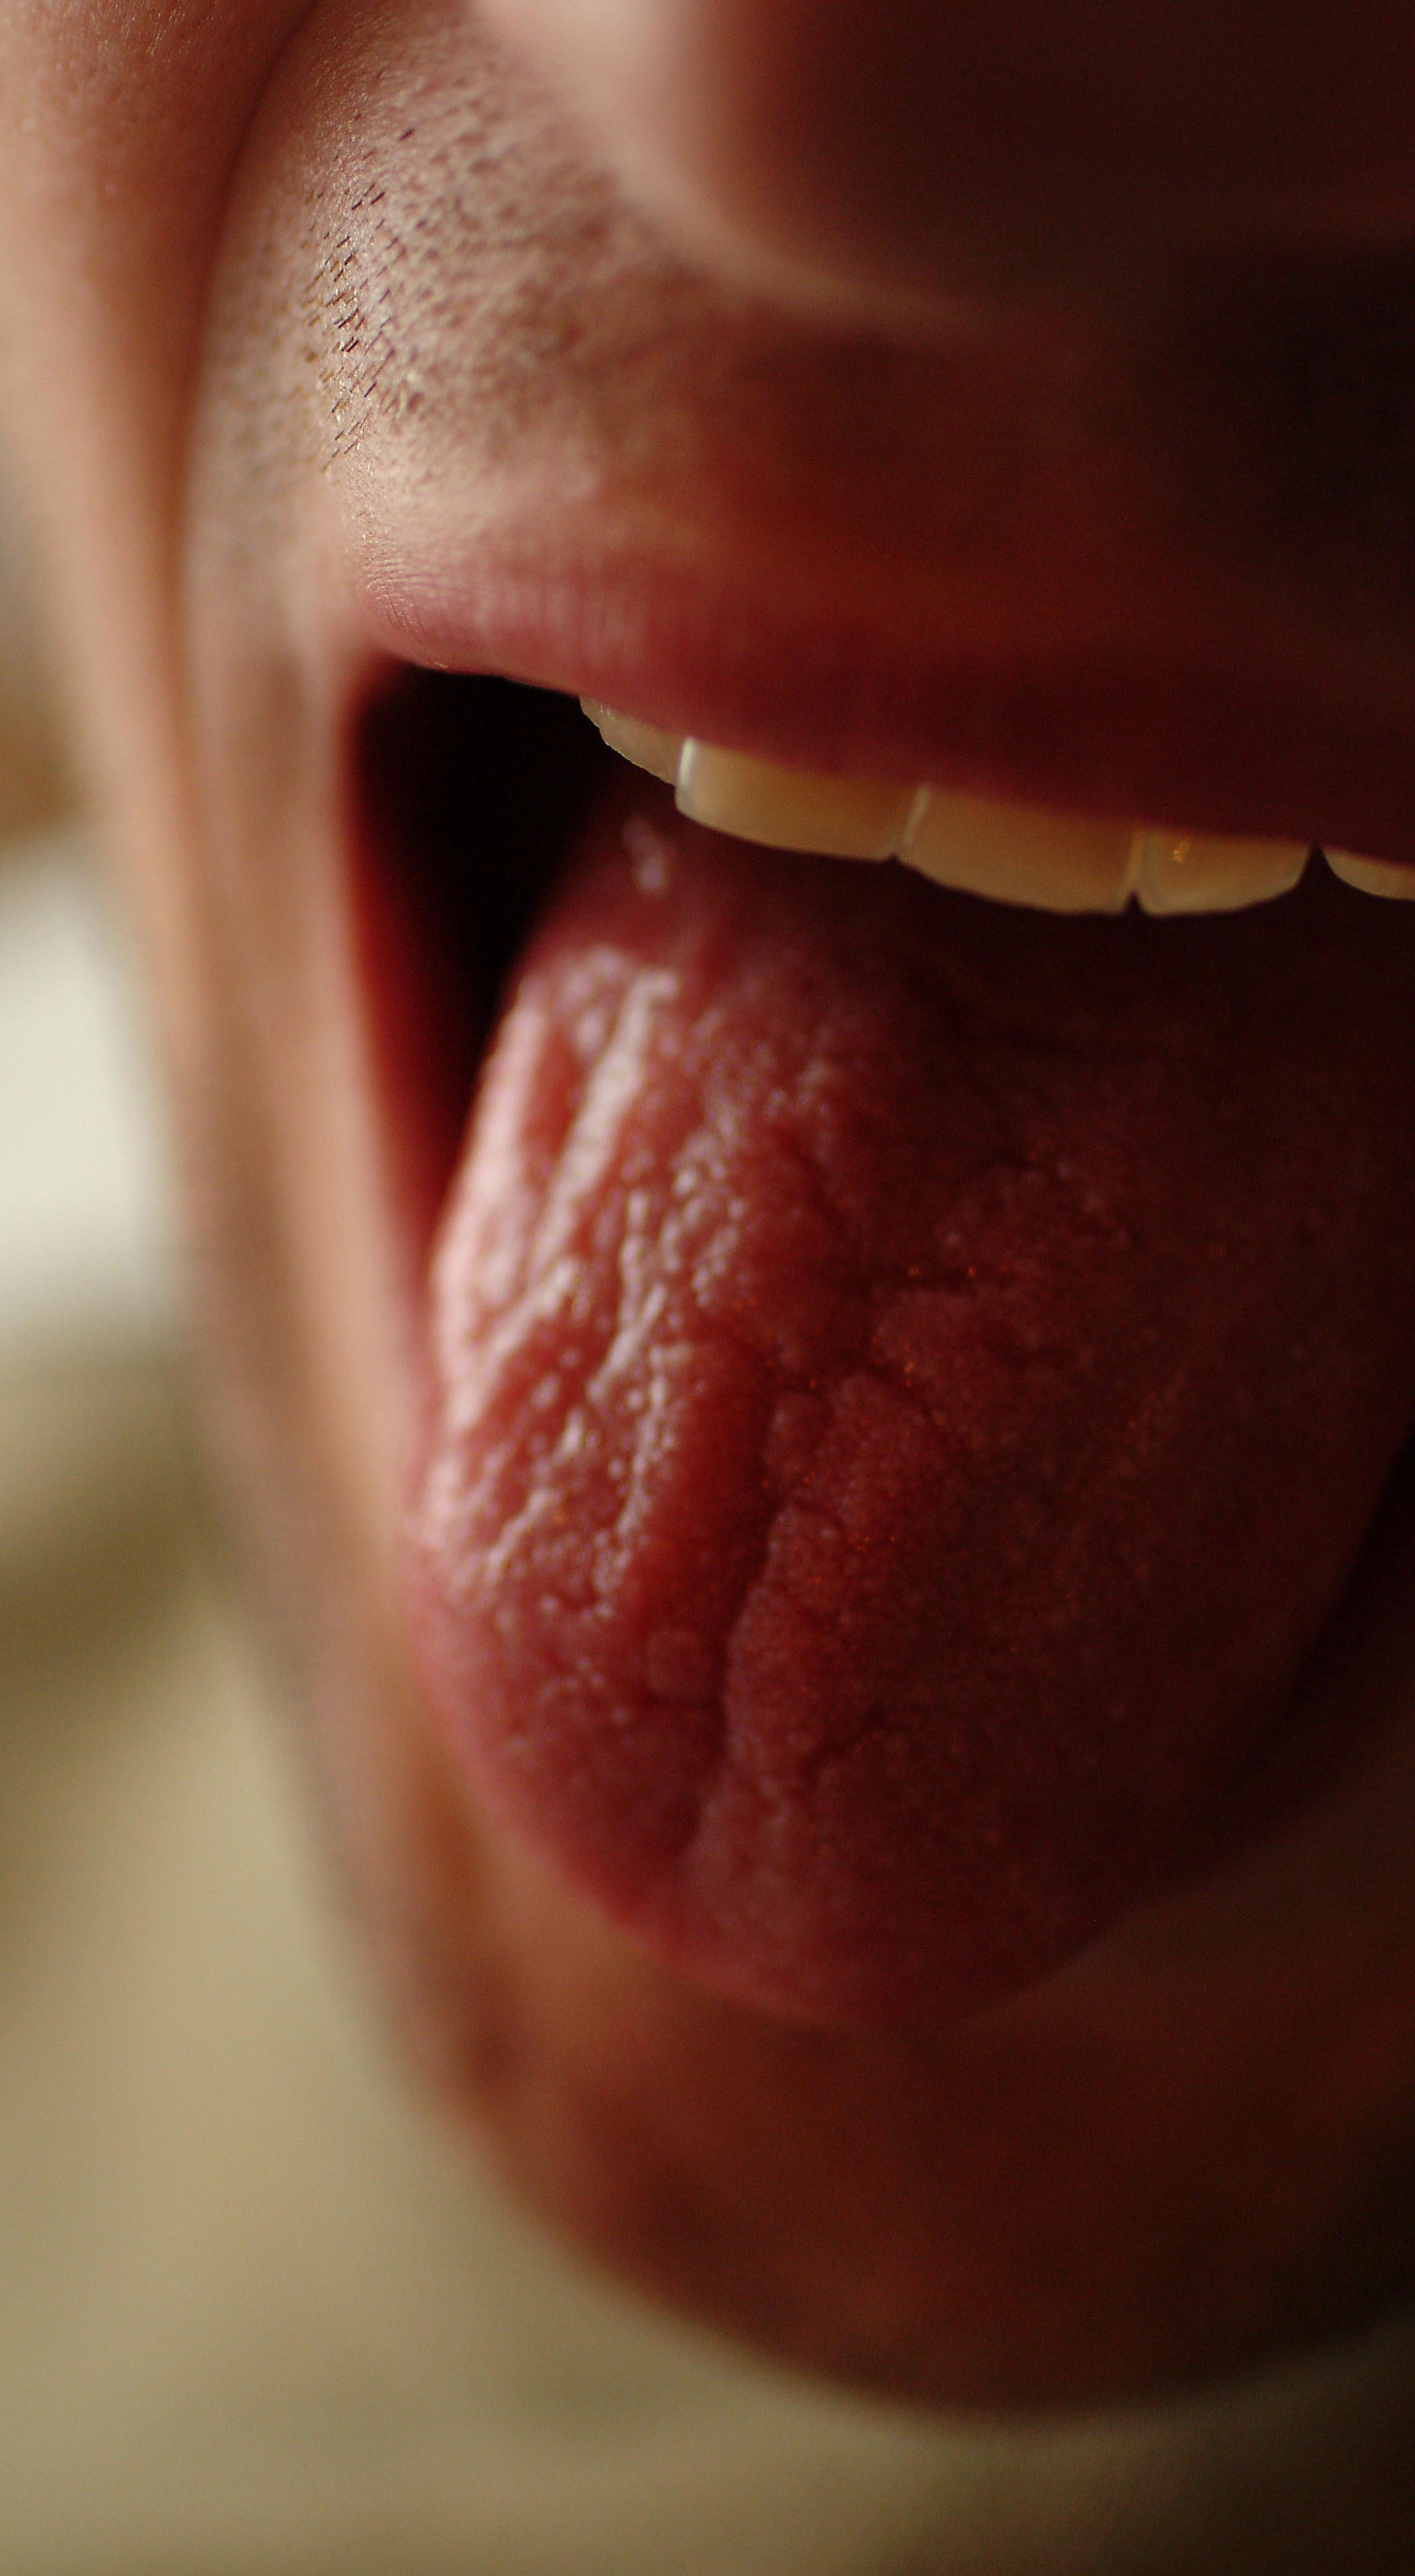 Wat zegt je tong?